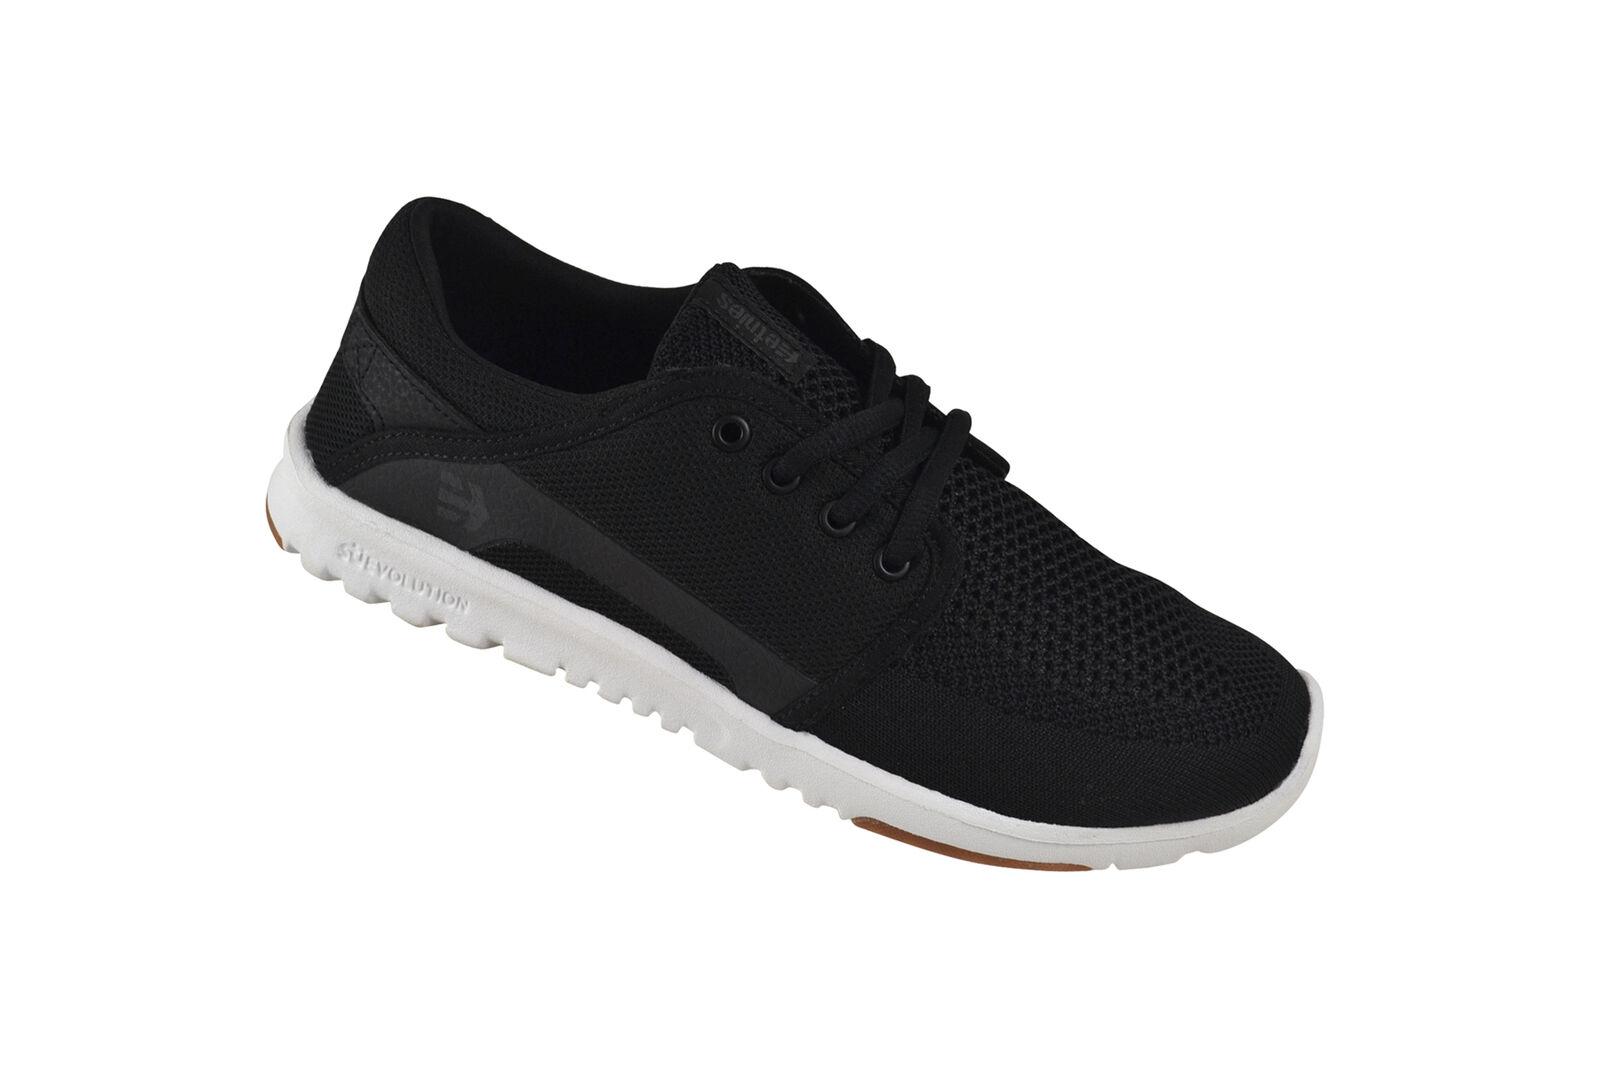 Etnies schwarz Scout YB black/white/gum Sneaker/Schuhe schwarz Etnies 4e981a